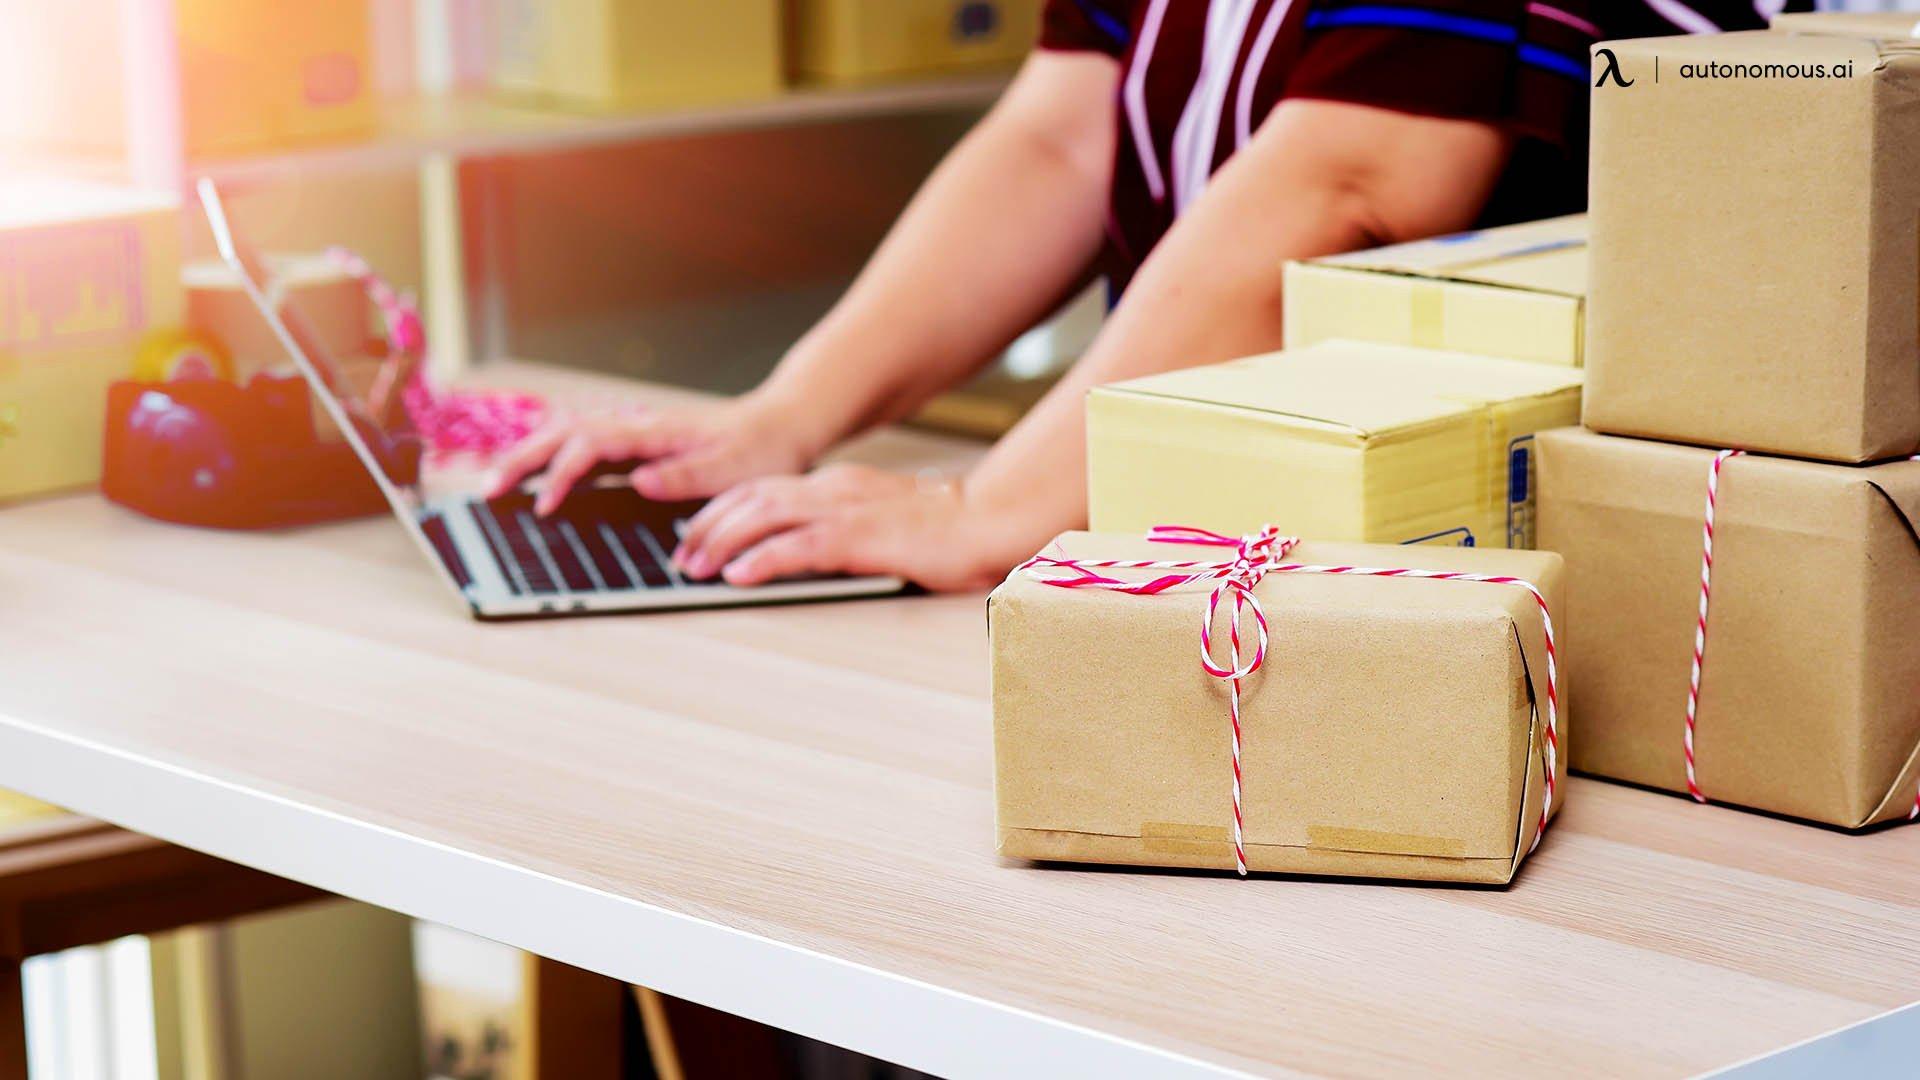 work online to earn money